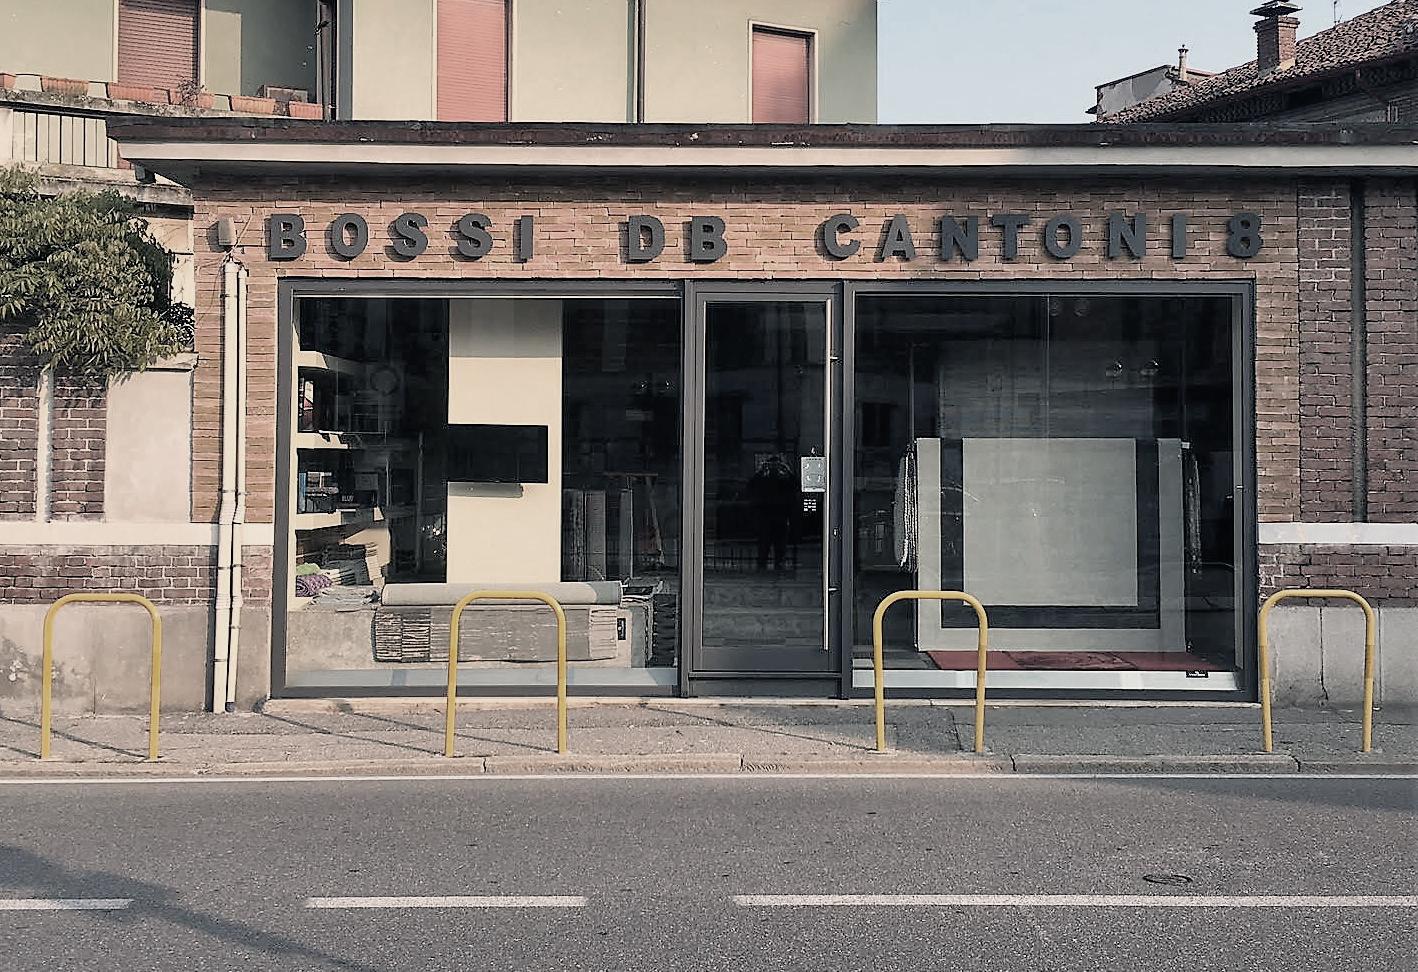 negozioest1.1.jpg